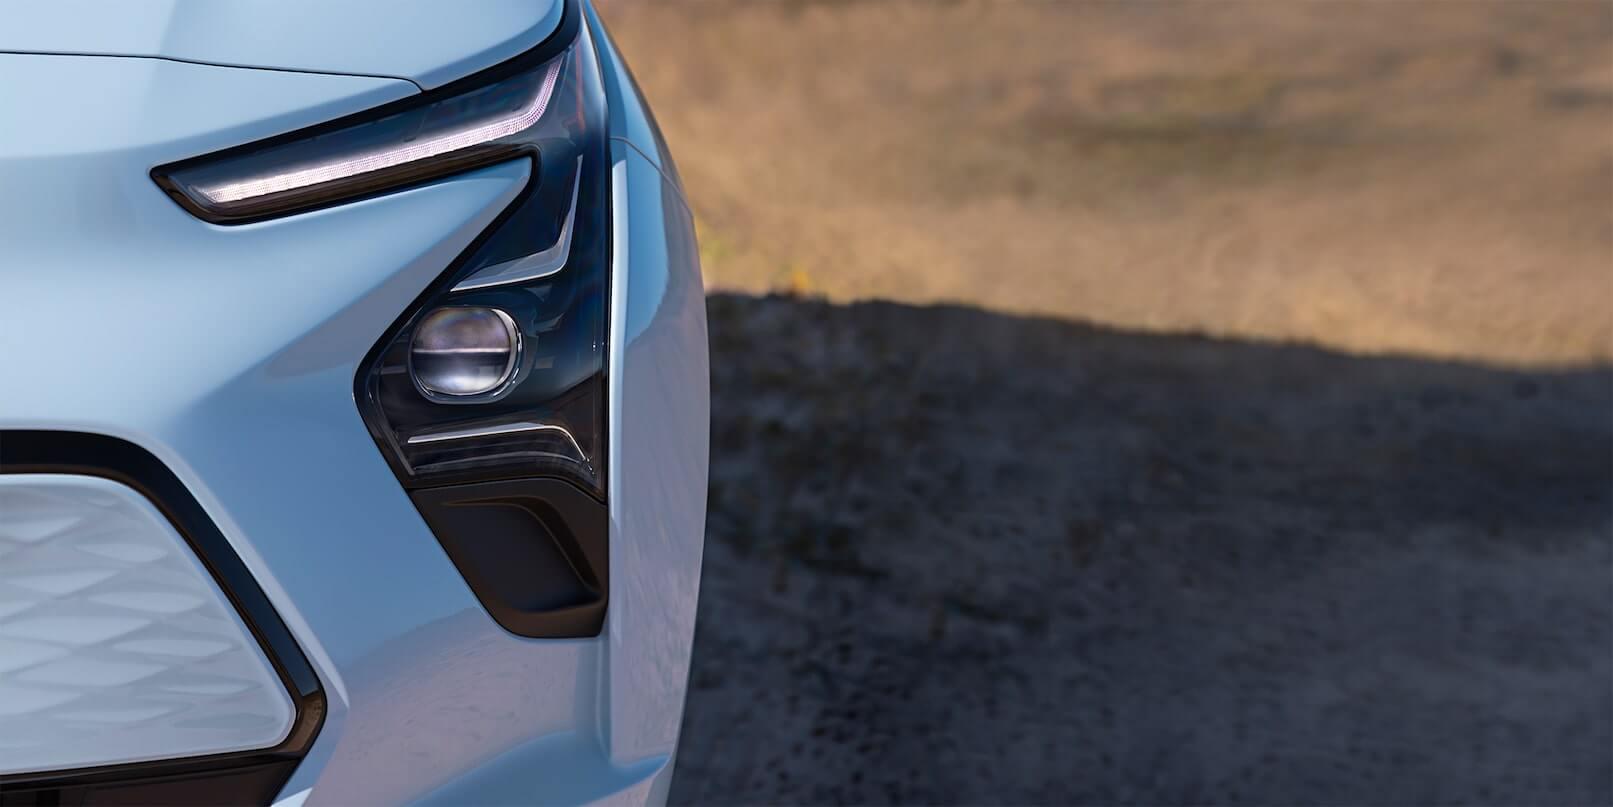 2022 Chevrolet Bolt EV headlights.